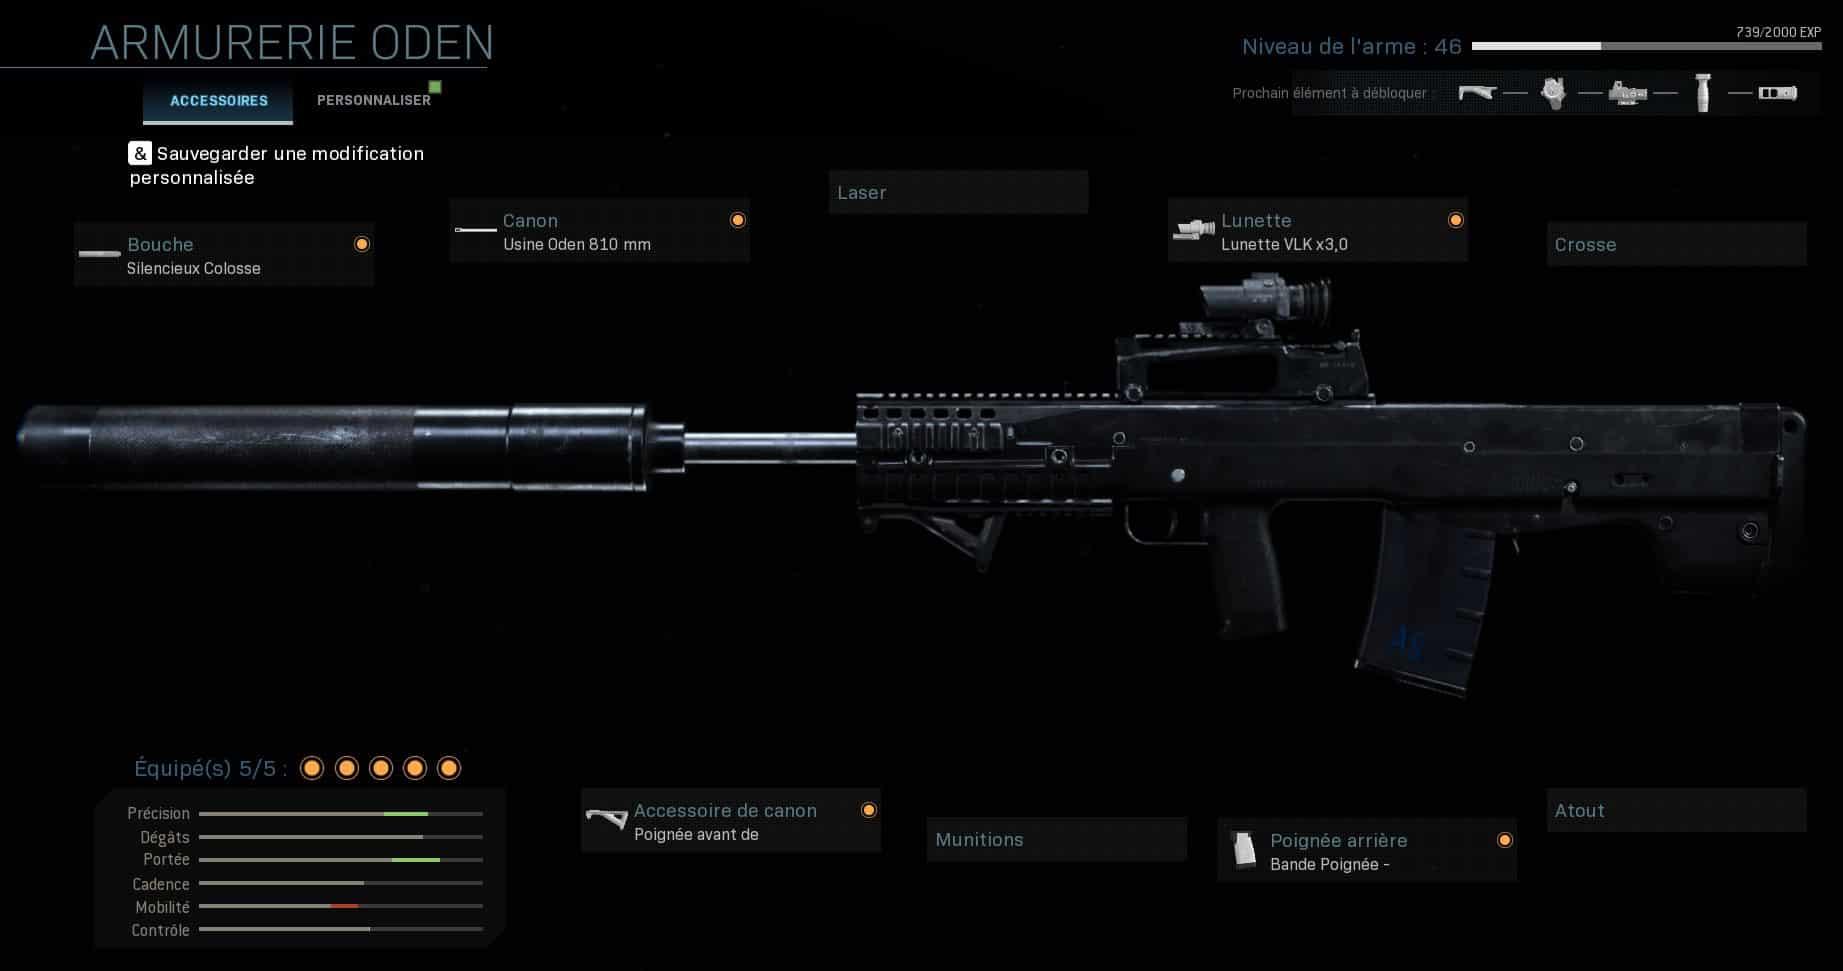 cod-call-of-duty-modern-warfare-oden-meilleurs-loadout-attachments-mod-gunsmith-xbox-ps4-pc-2